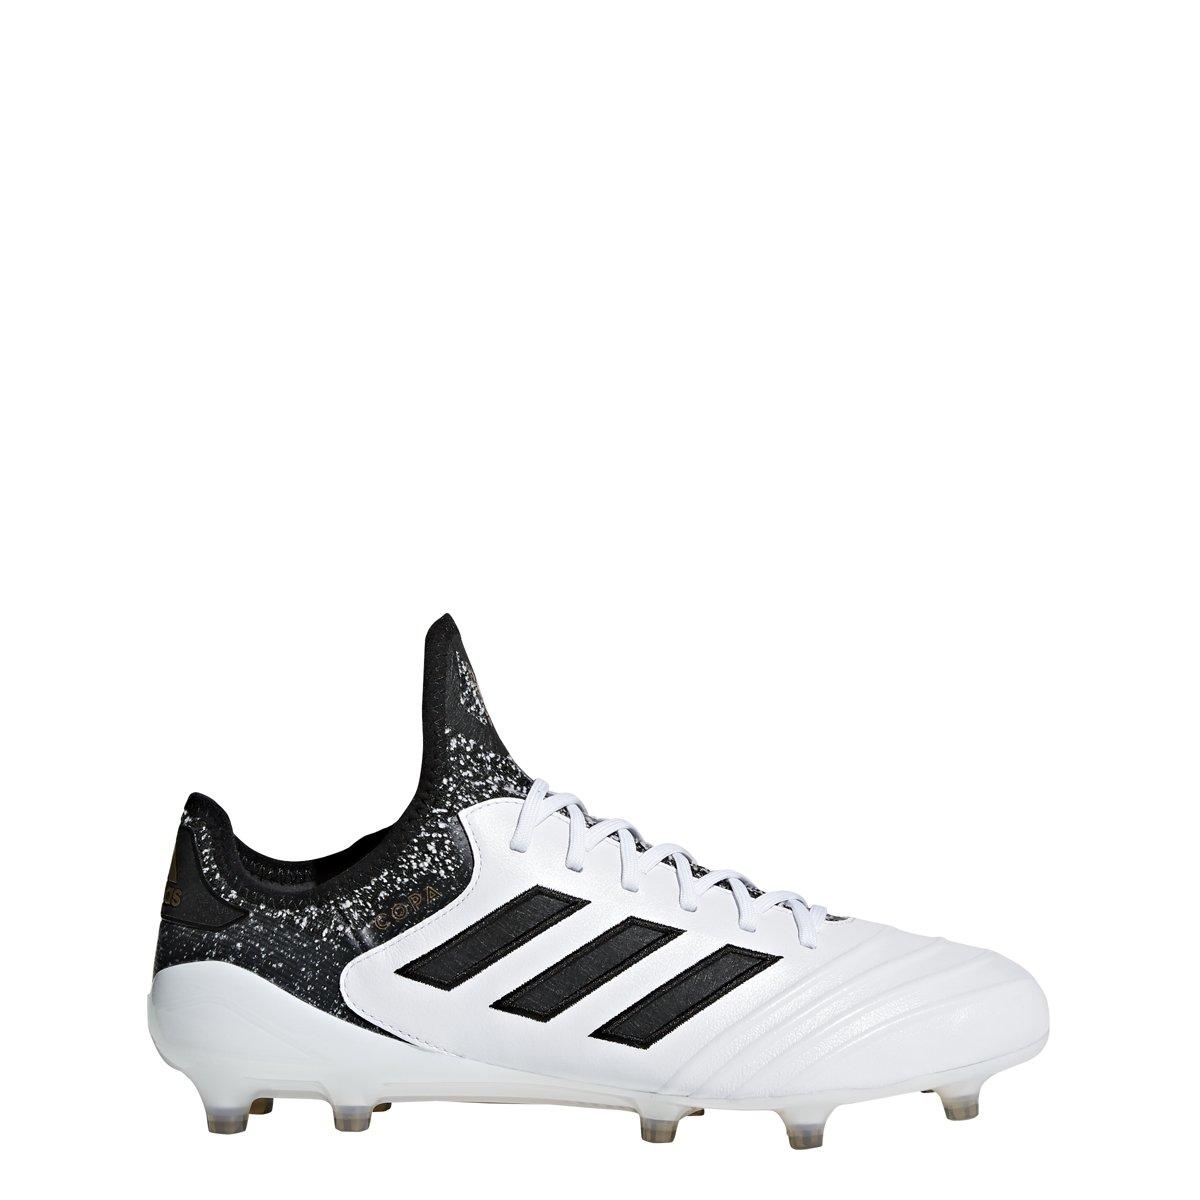 adidas Copa 18.1 FG Cleat Men's Soccer 8.5 White Core Black Tactile Gold Metallic